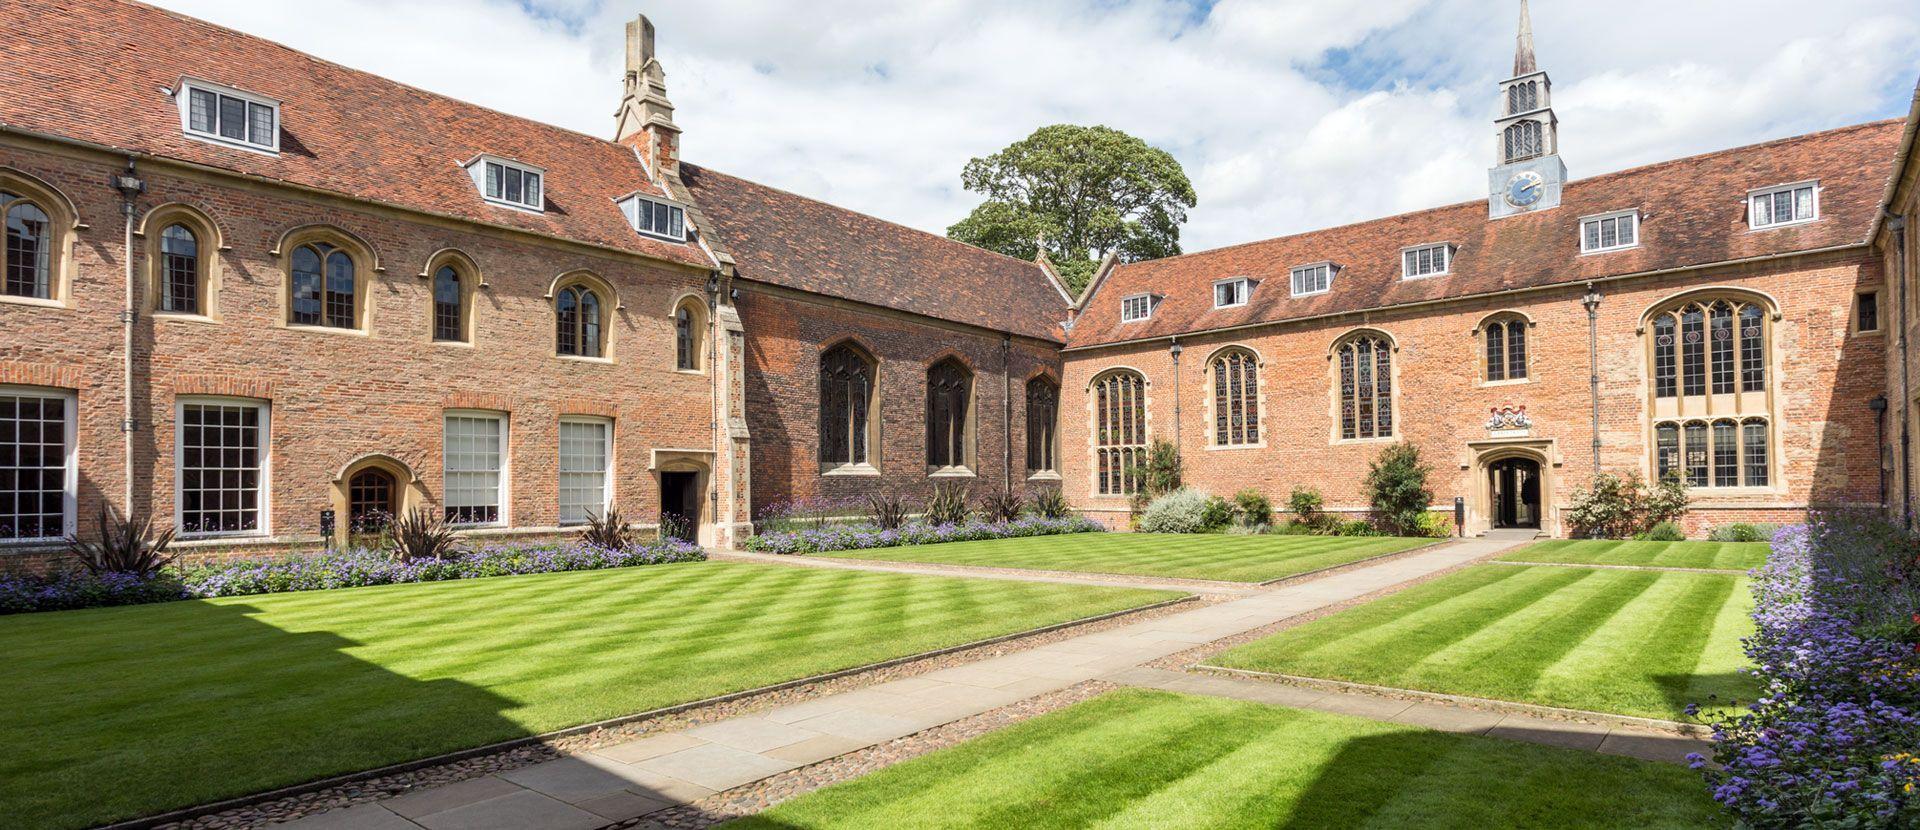 Cambridge Avanzado Reino Unido curso de ingles ASTEX